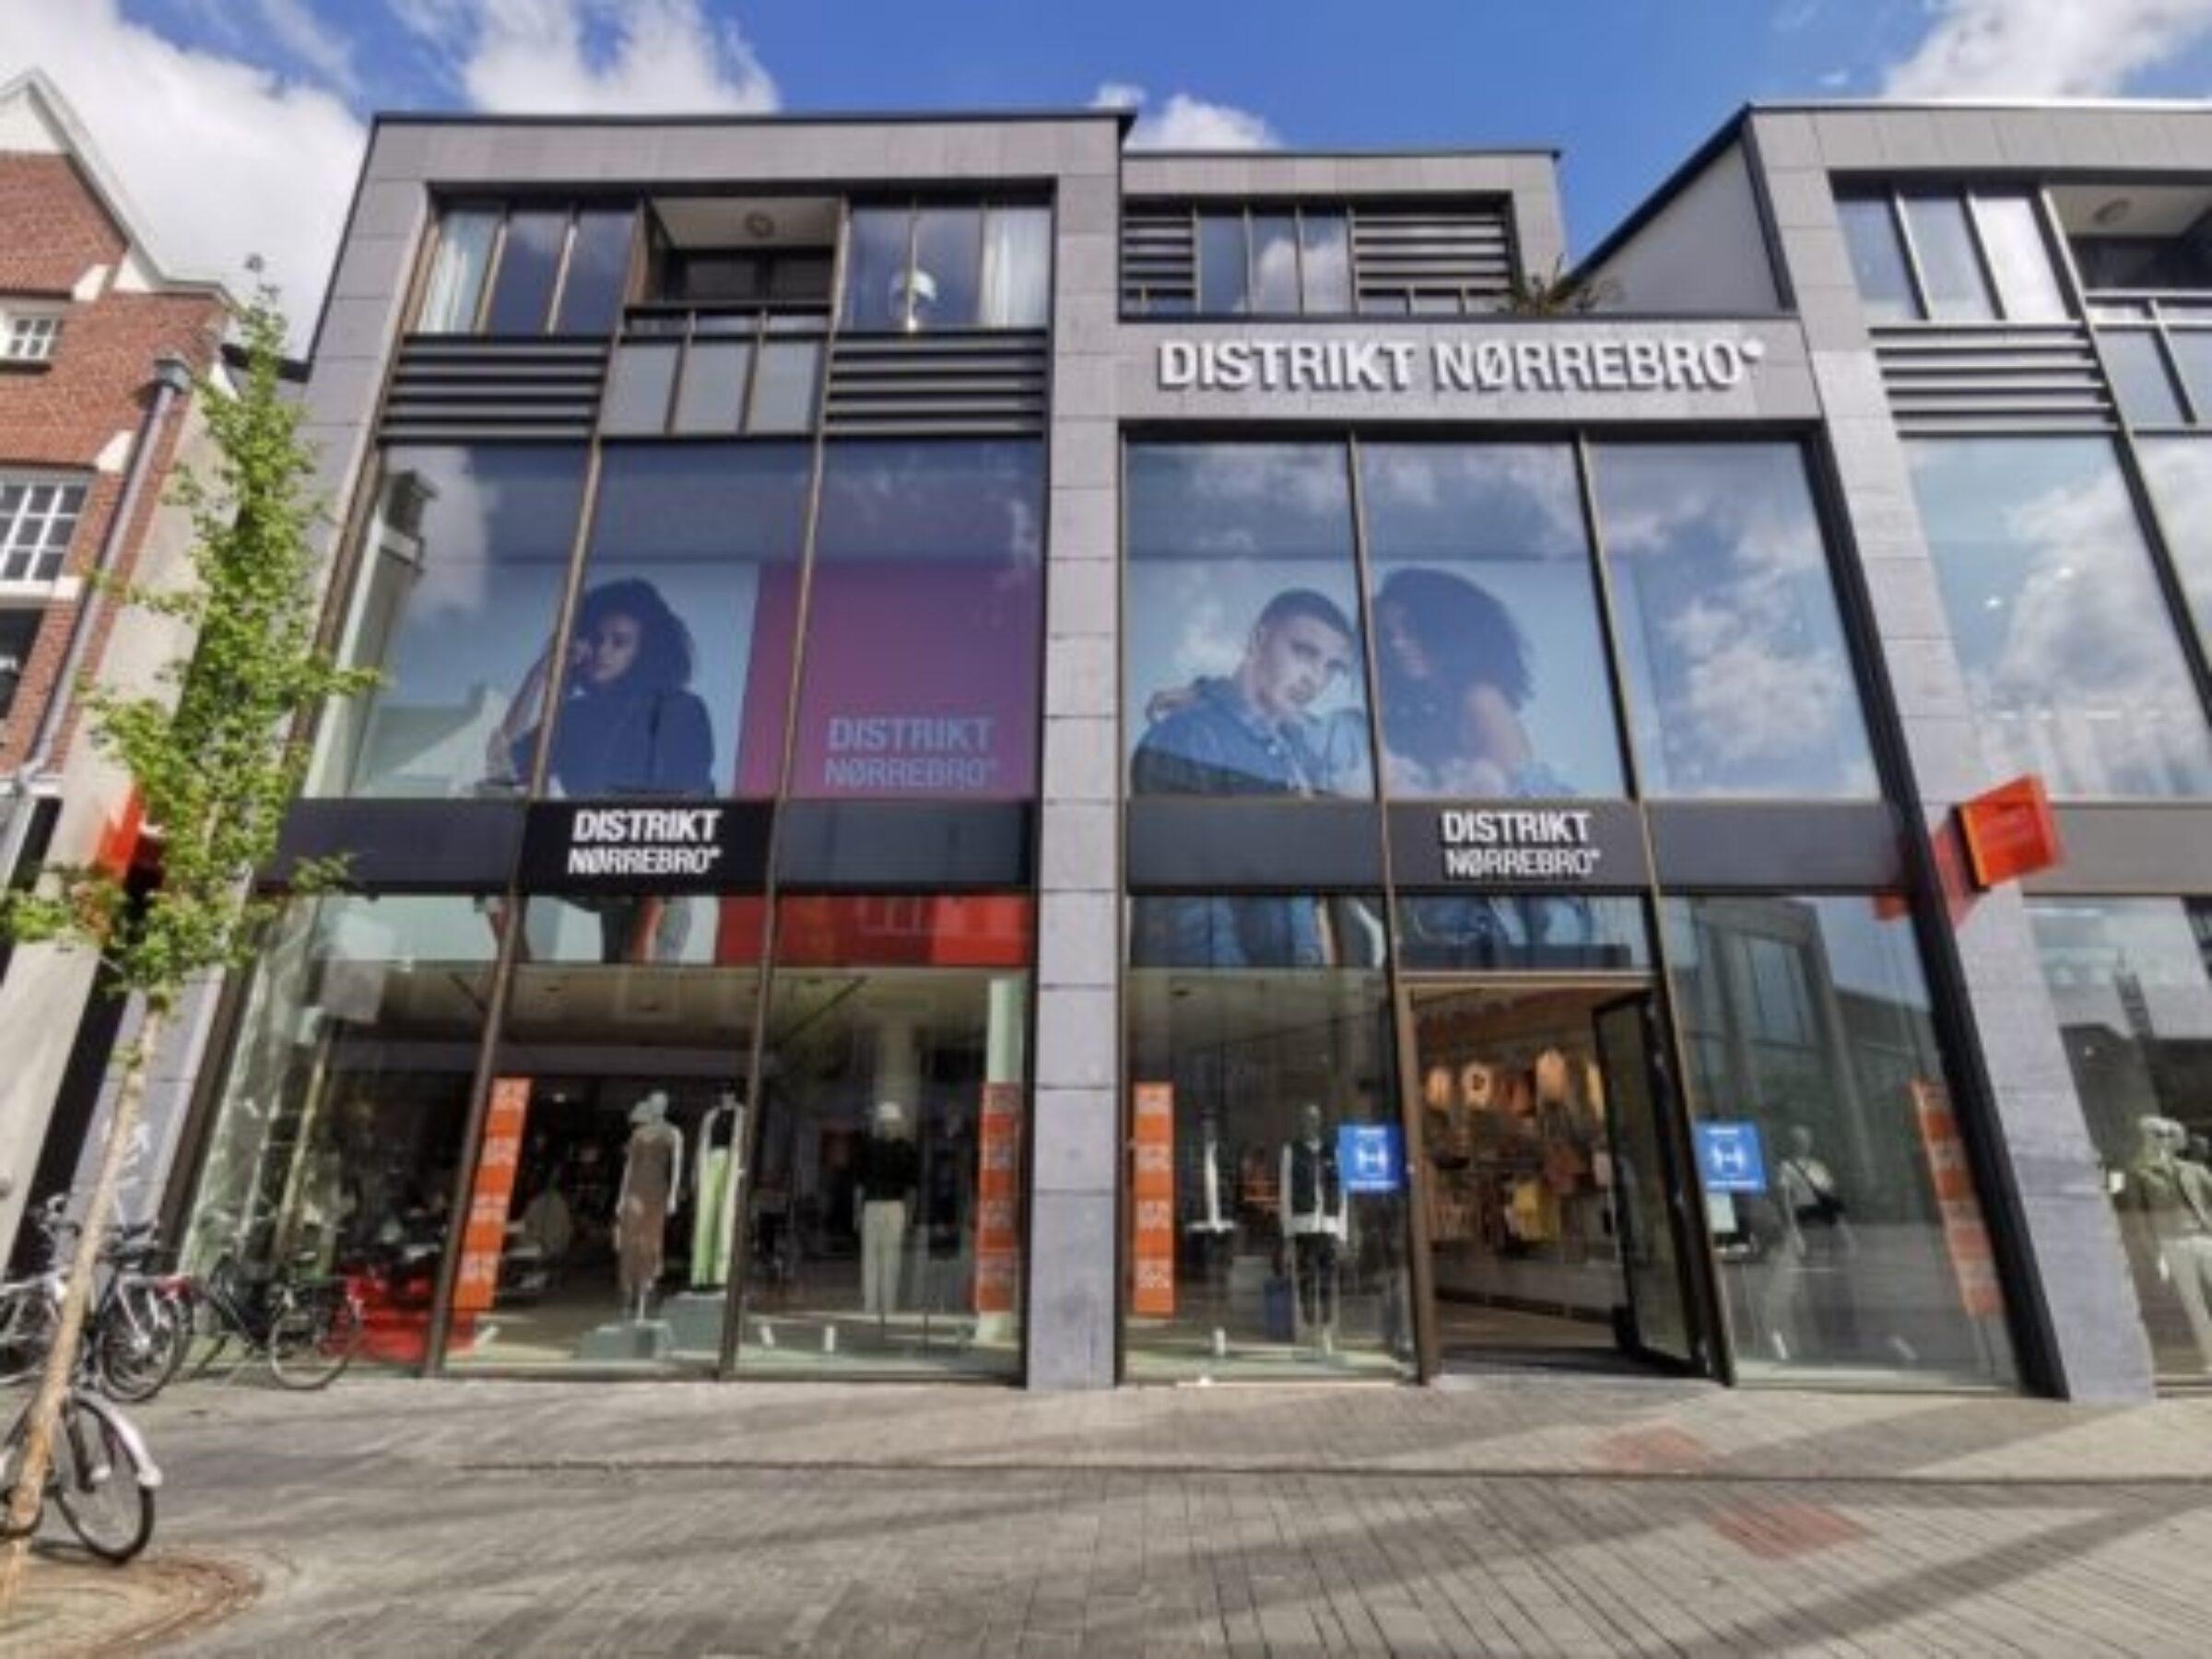 Distrikt Nørrebro Enschede